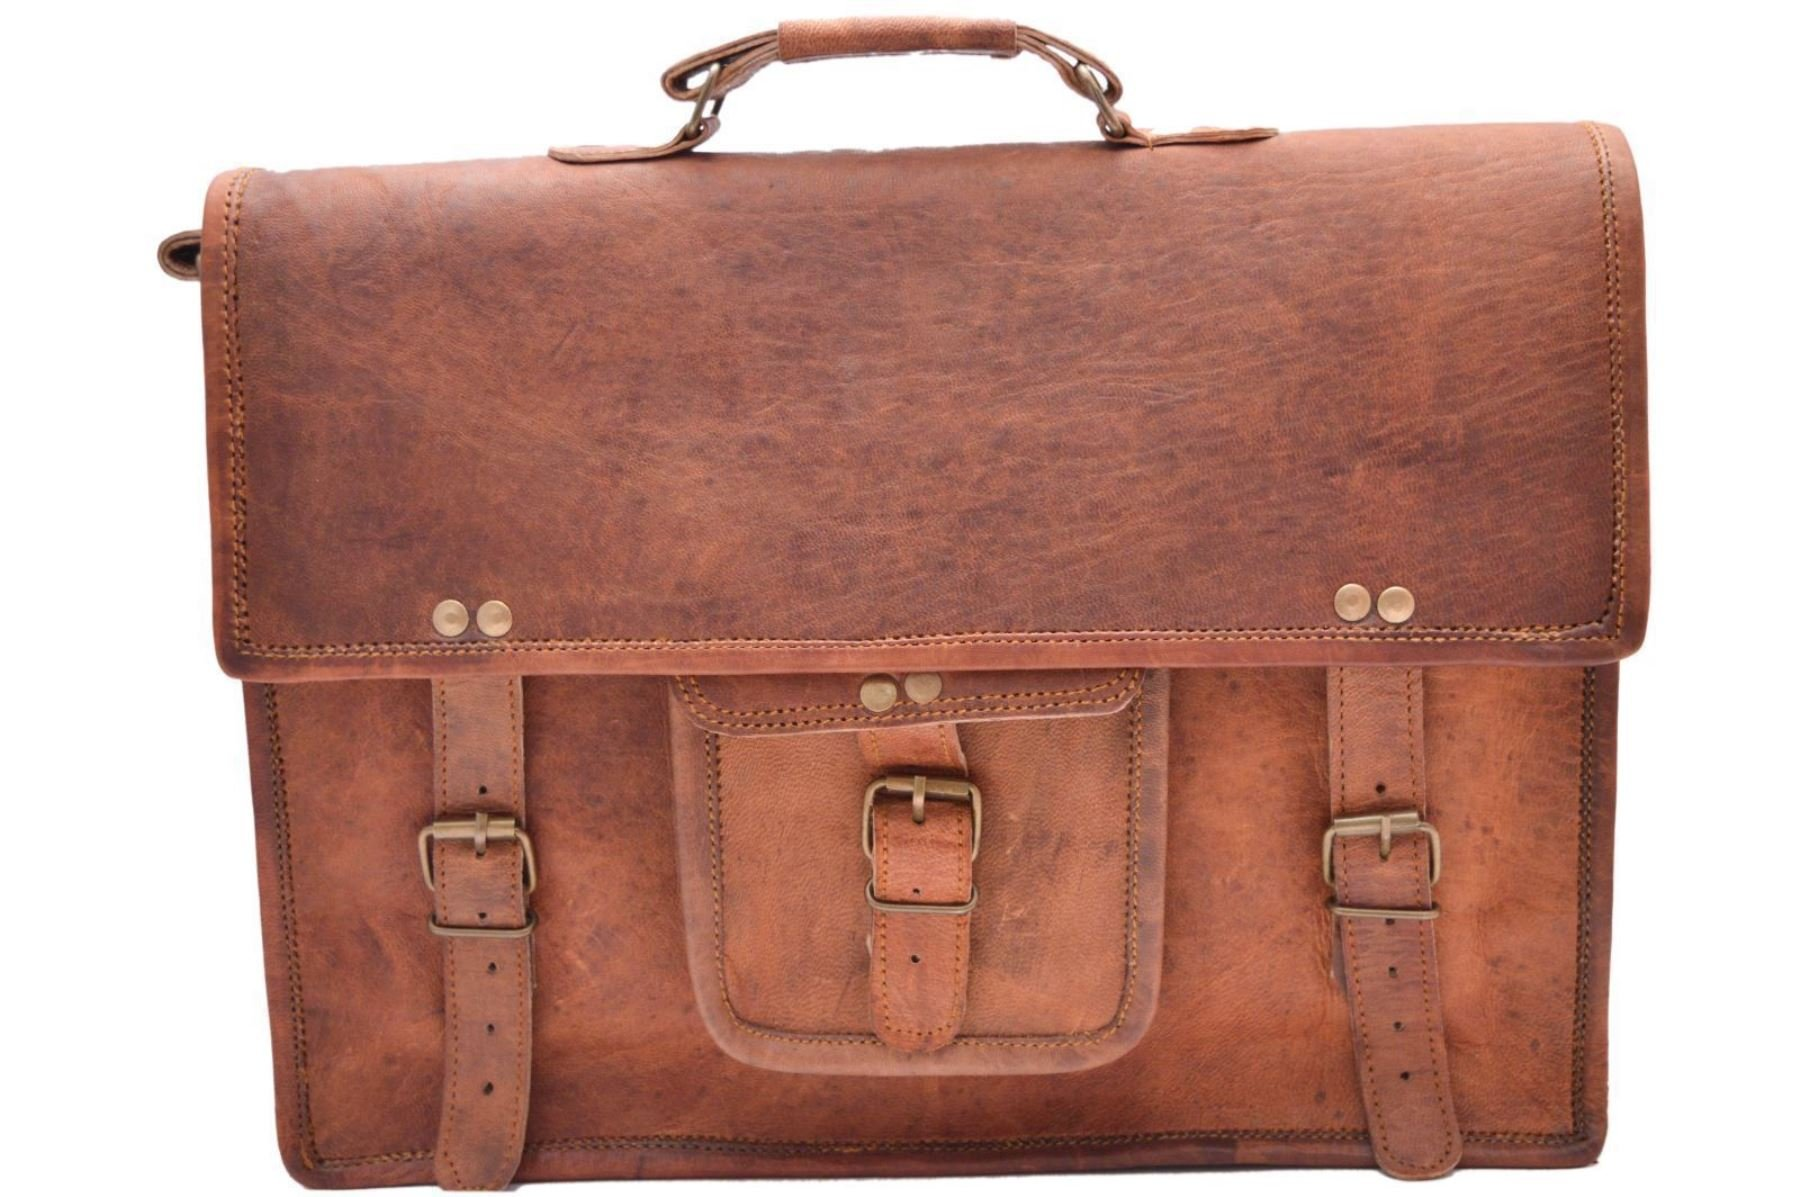 Handcrafted exports 15'' Vintage Rustic Leather Laptop Briefcase Messenger Bag